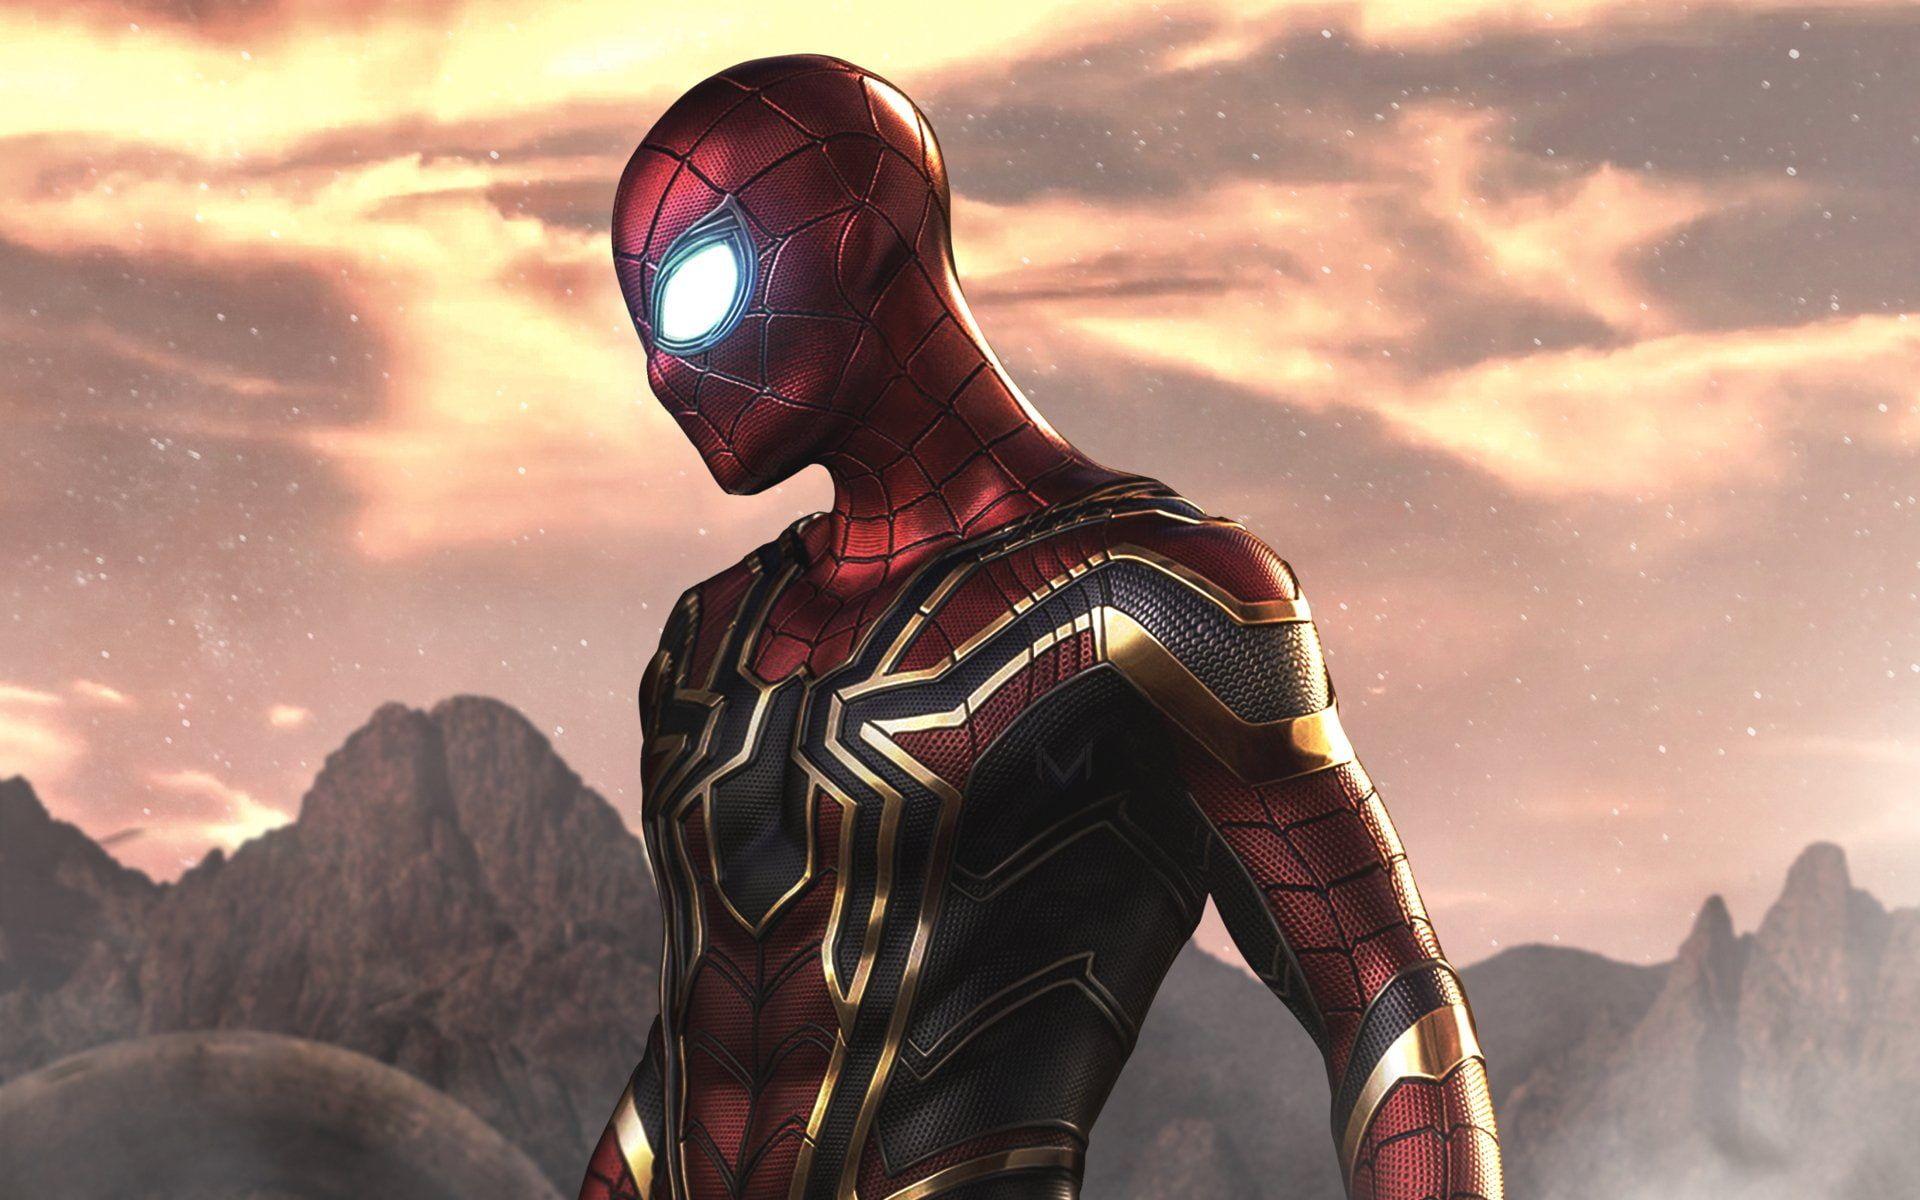 Movie Avengers Infinity War Iron Spider Marvel Comics Spider Man 1080p Wallpaper Hdwallpaper Desktop In 2020 Spiderman Superhero Avengers Wallpaper